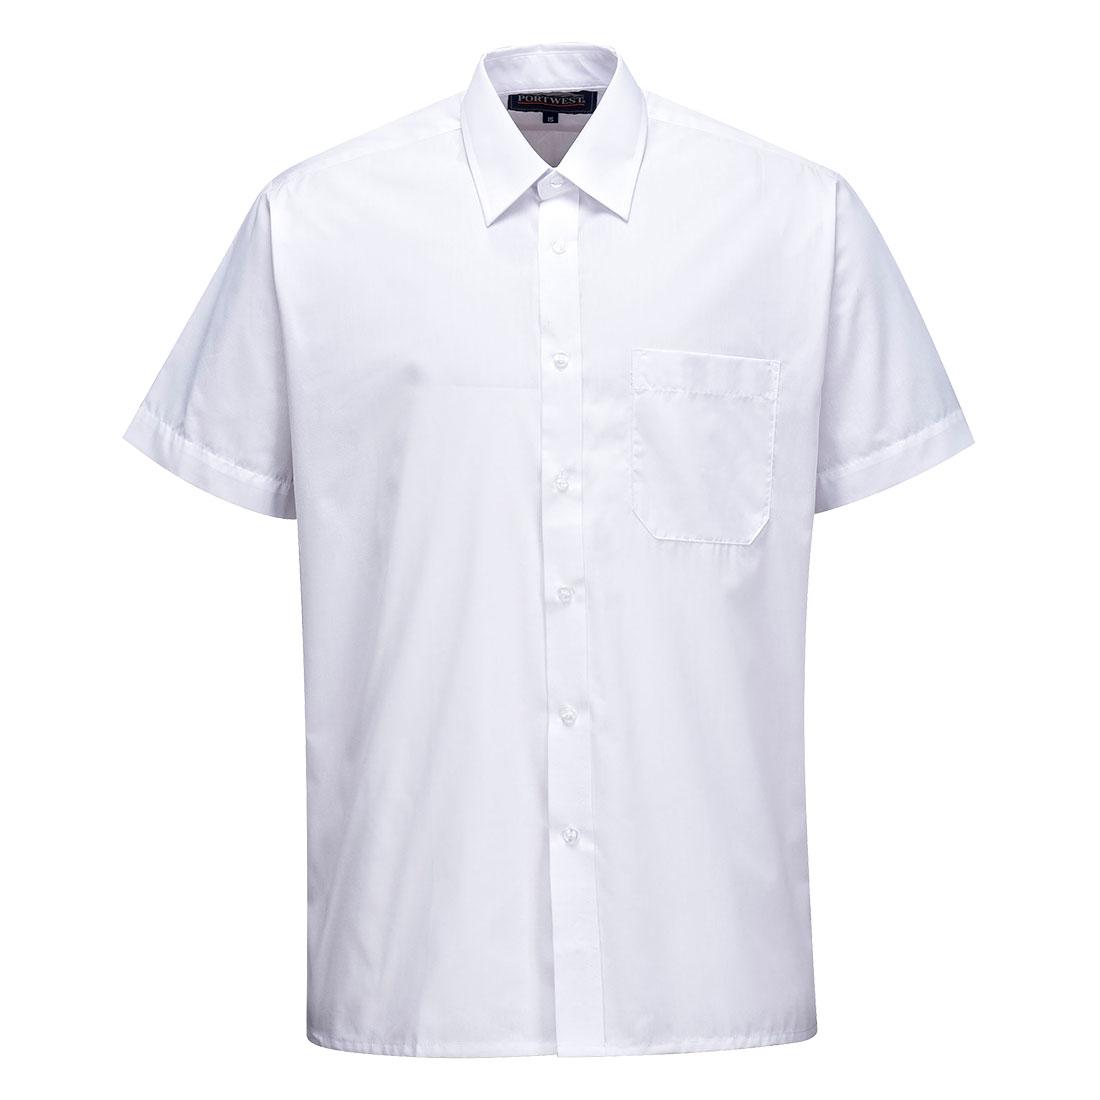 Classic Shirt Short Slv. White 185R